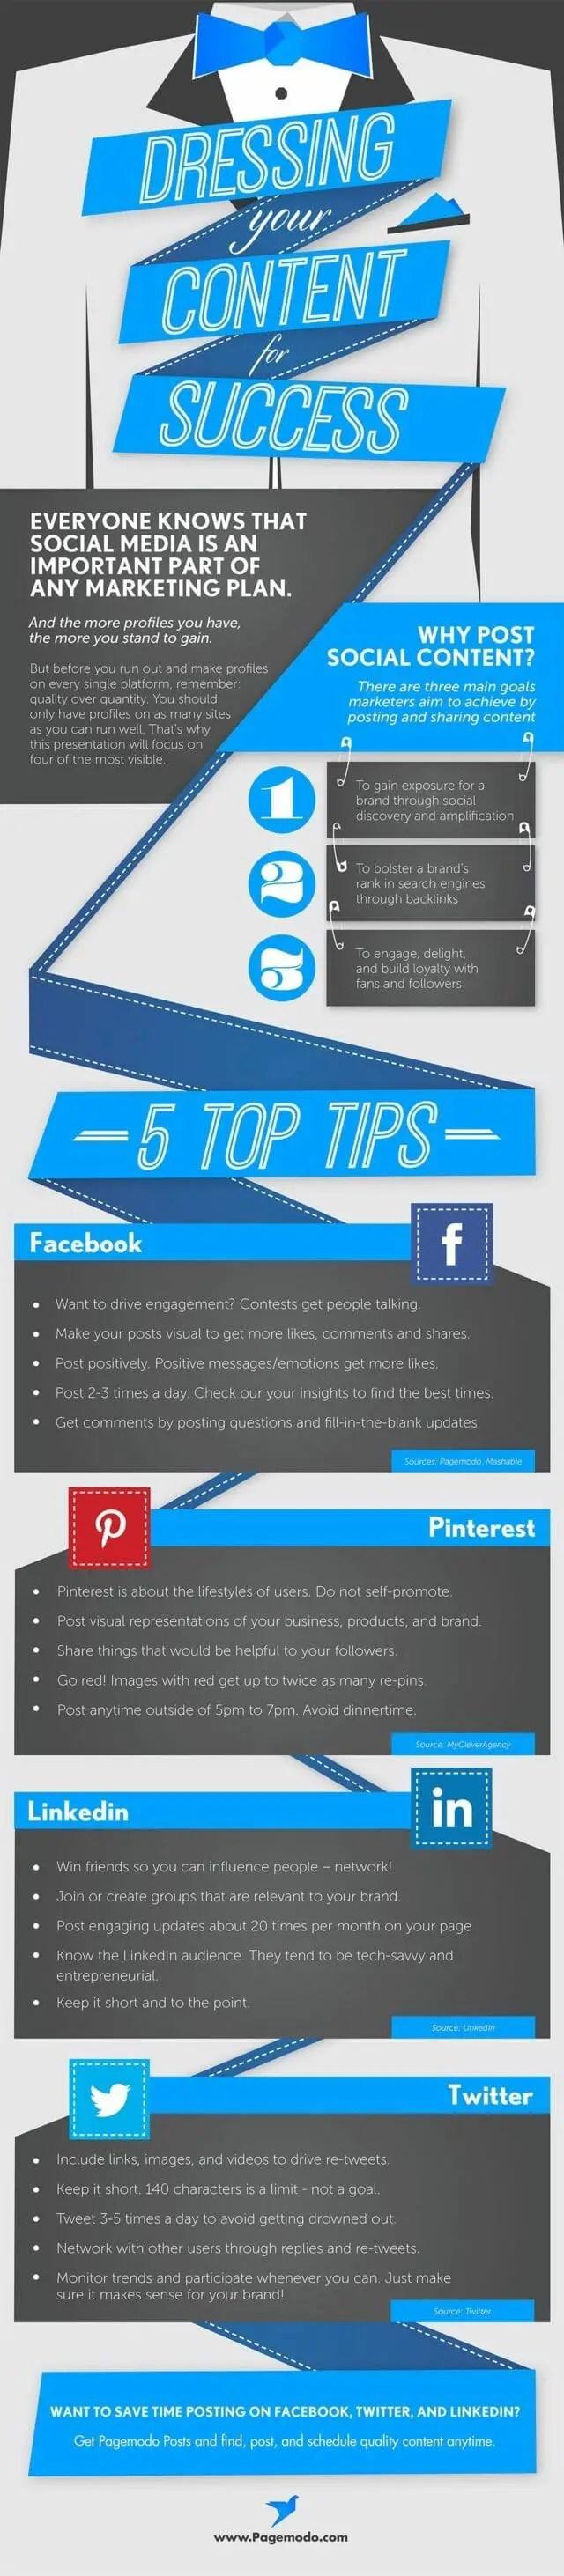 social-content-best-practices-facebook-twitter-linkedin